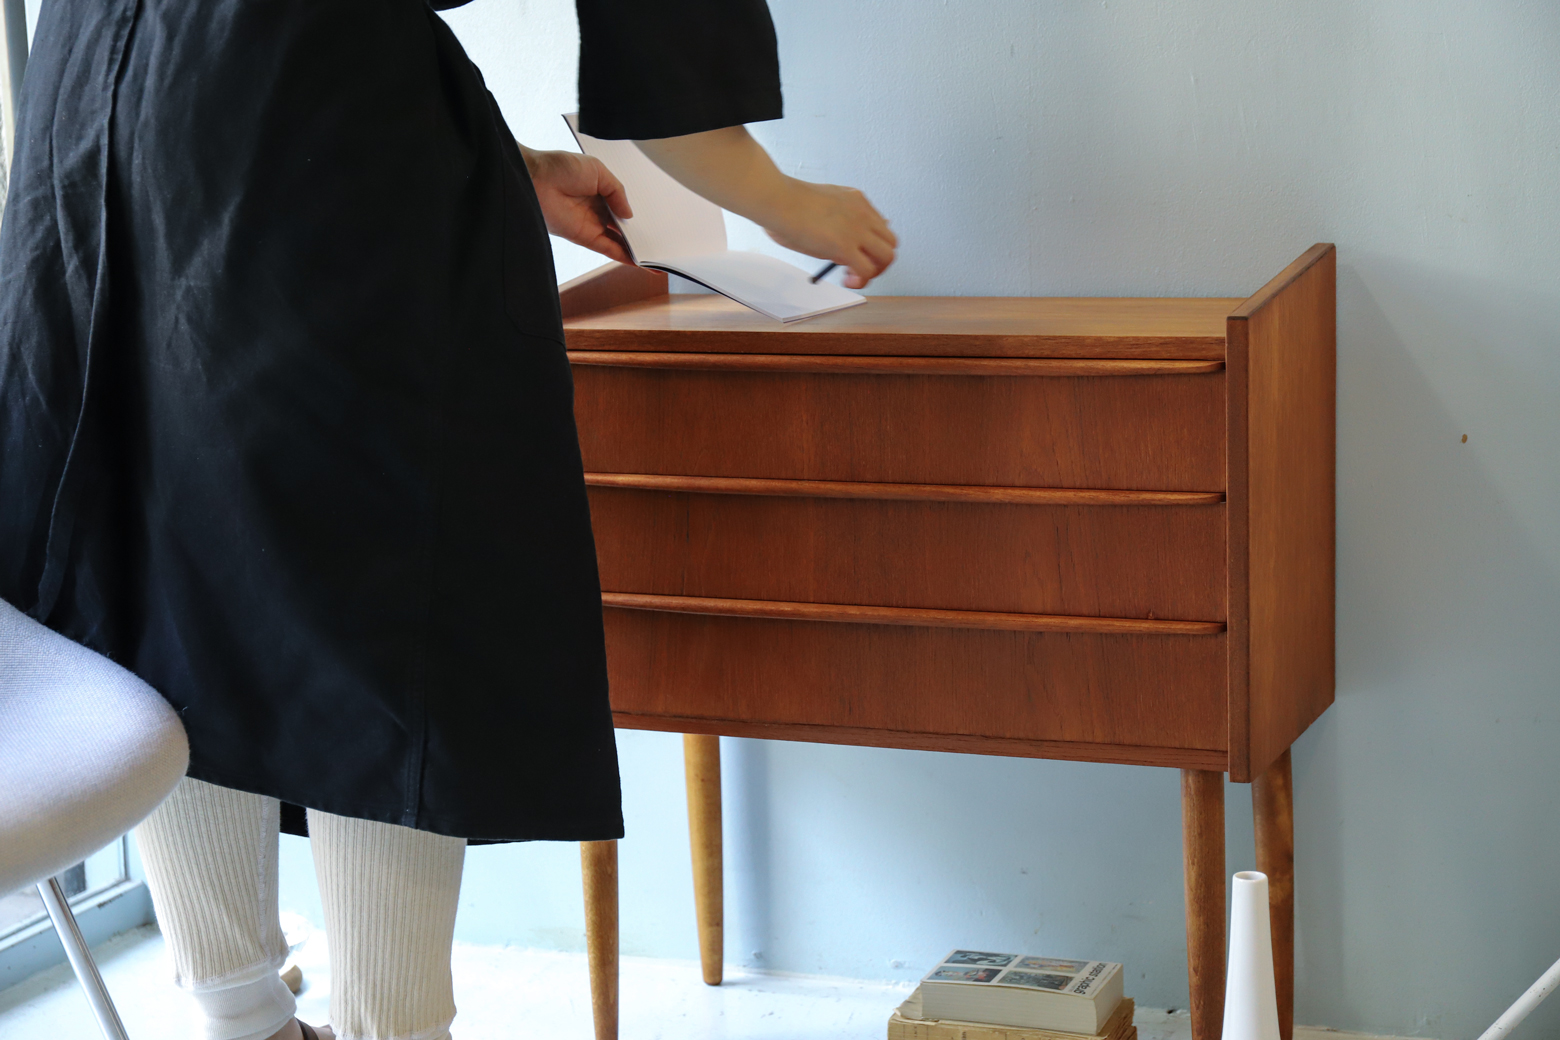 Danish Vintage Teak Wood Side Chest/デンマーク ヴィンテージ チーク材 サイドチェスト 北欧家具